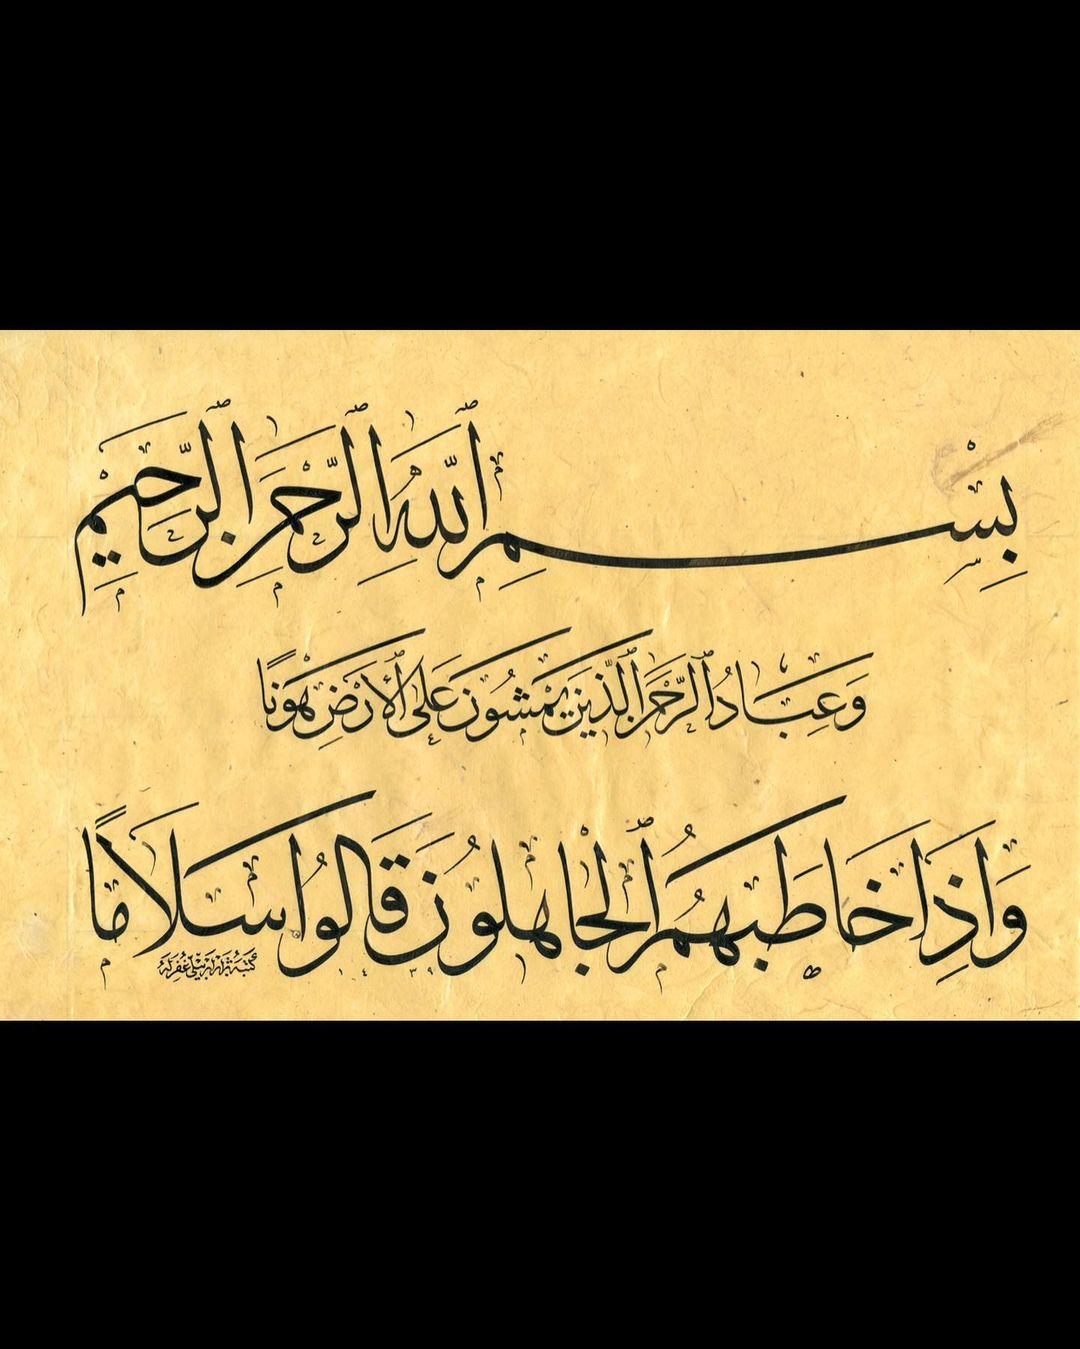 Professional Calligrapher Bijar Arbilly Calligraphy  القران الكريم .. #calligraphy #kunst #art #tehran #istanbul #arabic #london #dub… 235